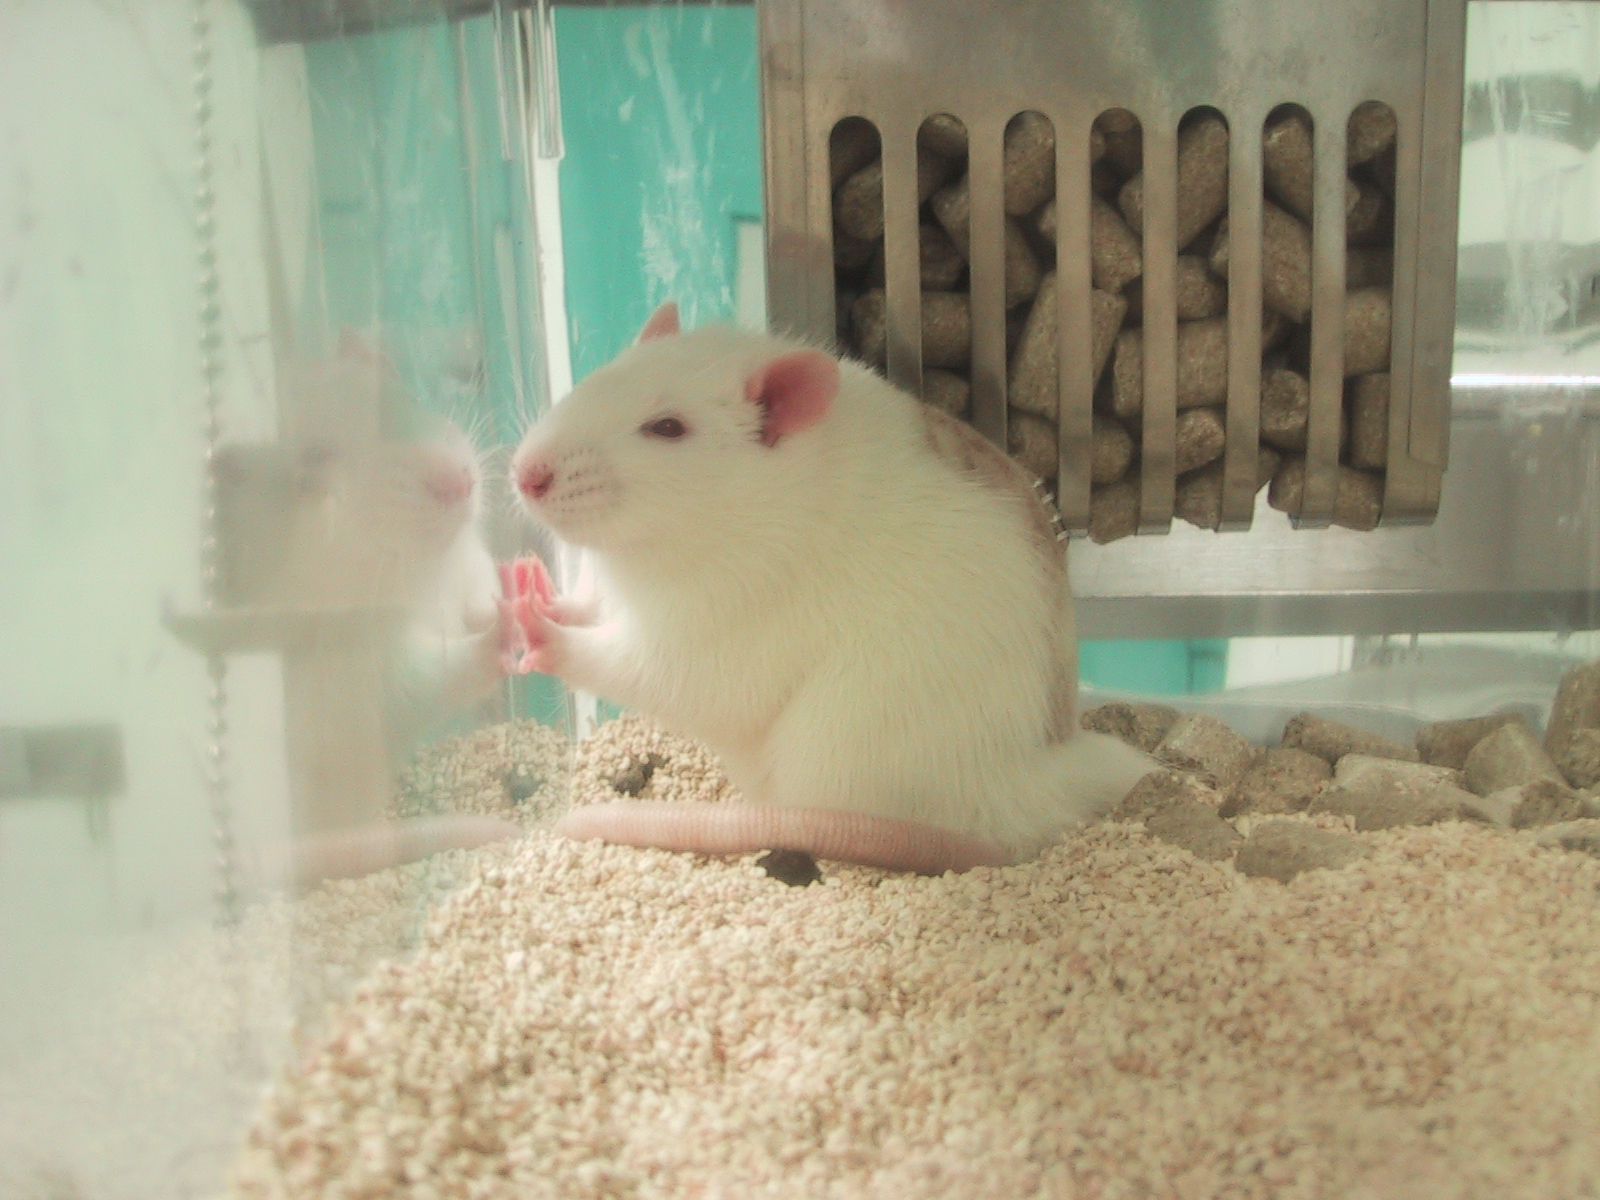 Victory! Nine Japan-Based Companies End Tests on Animals